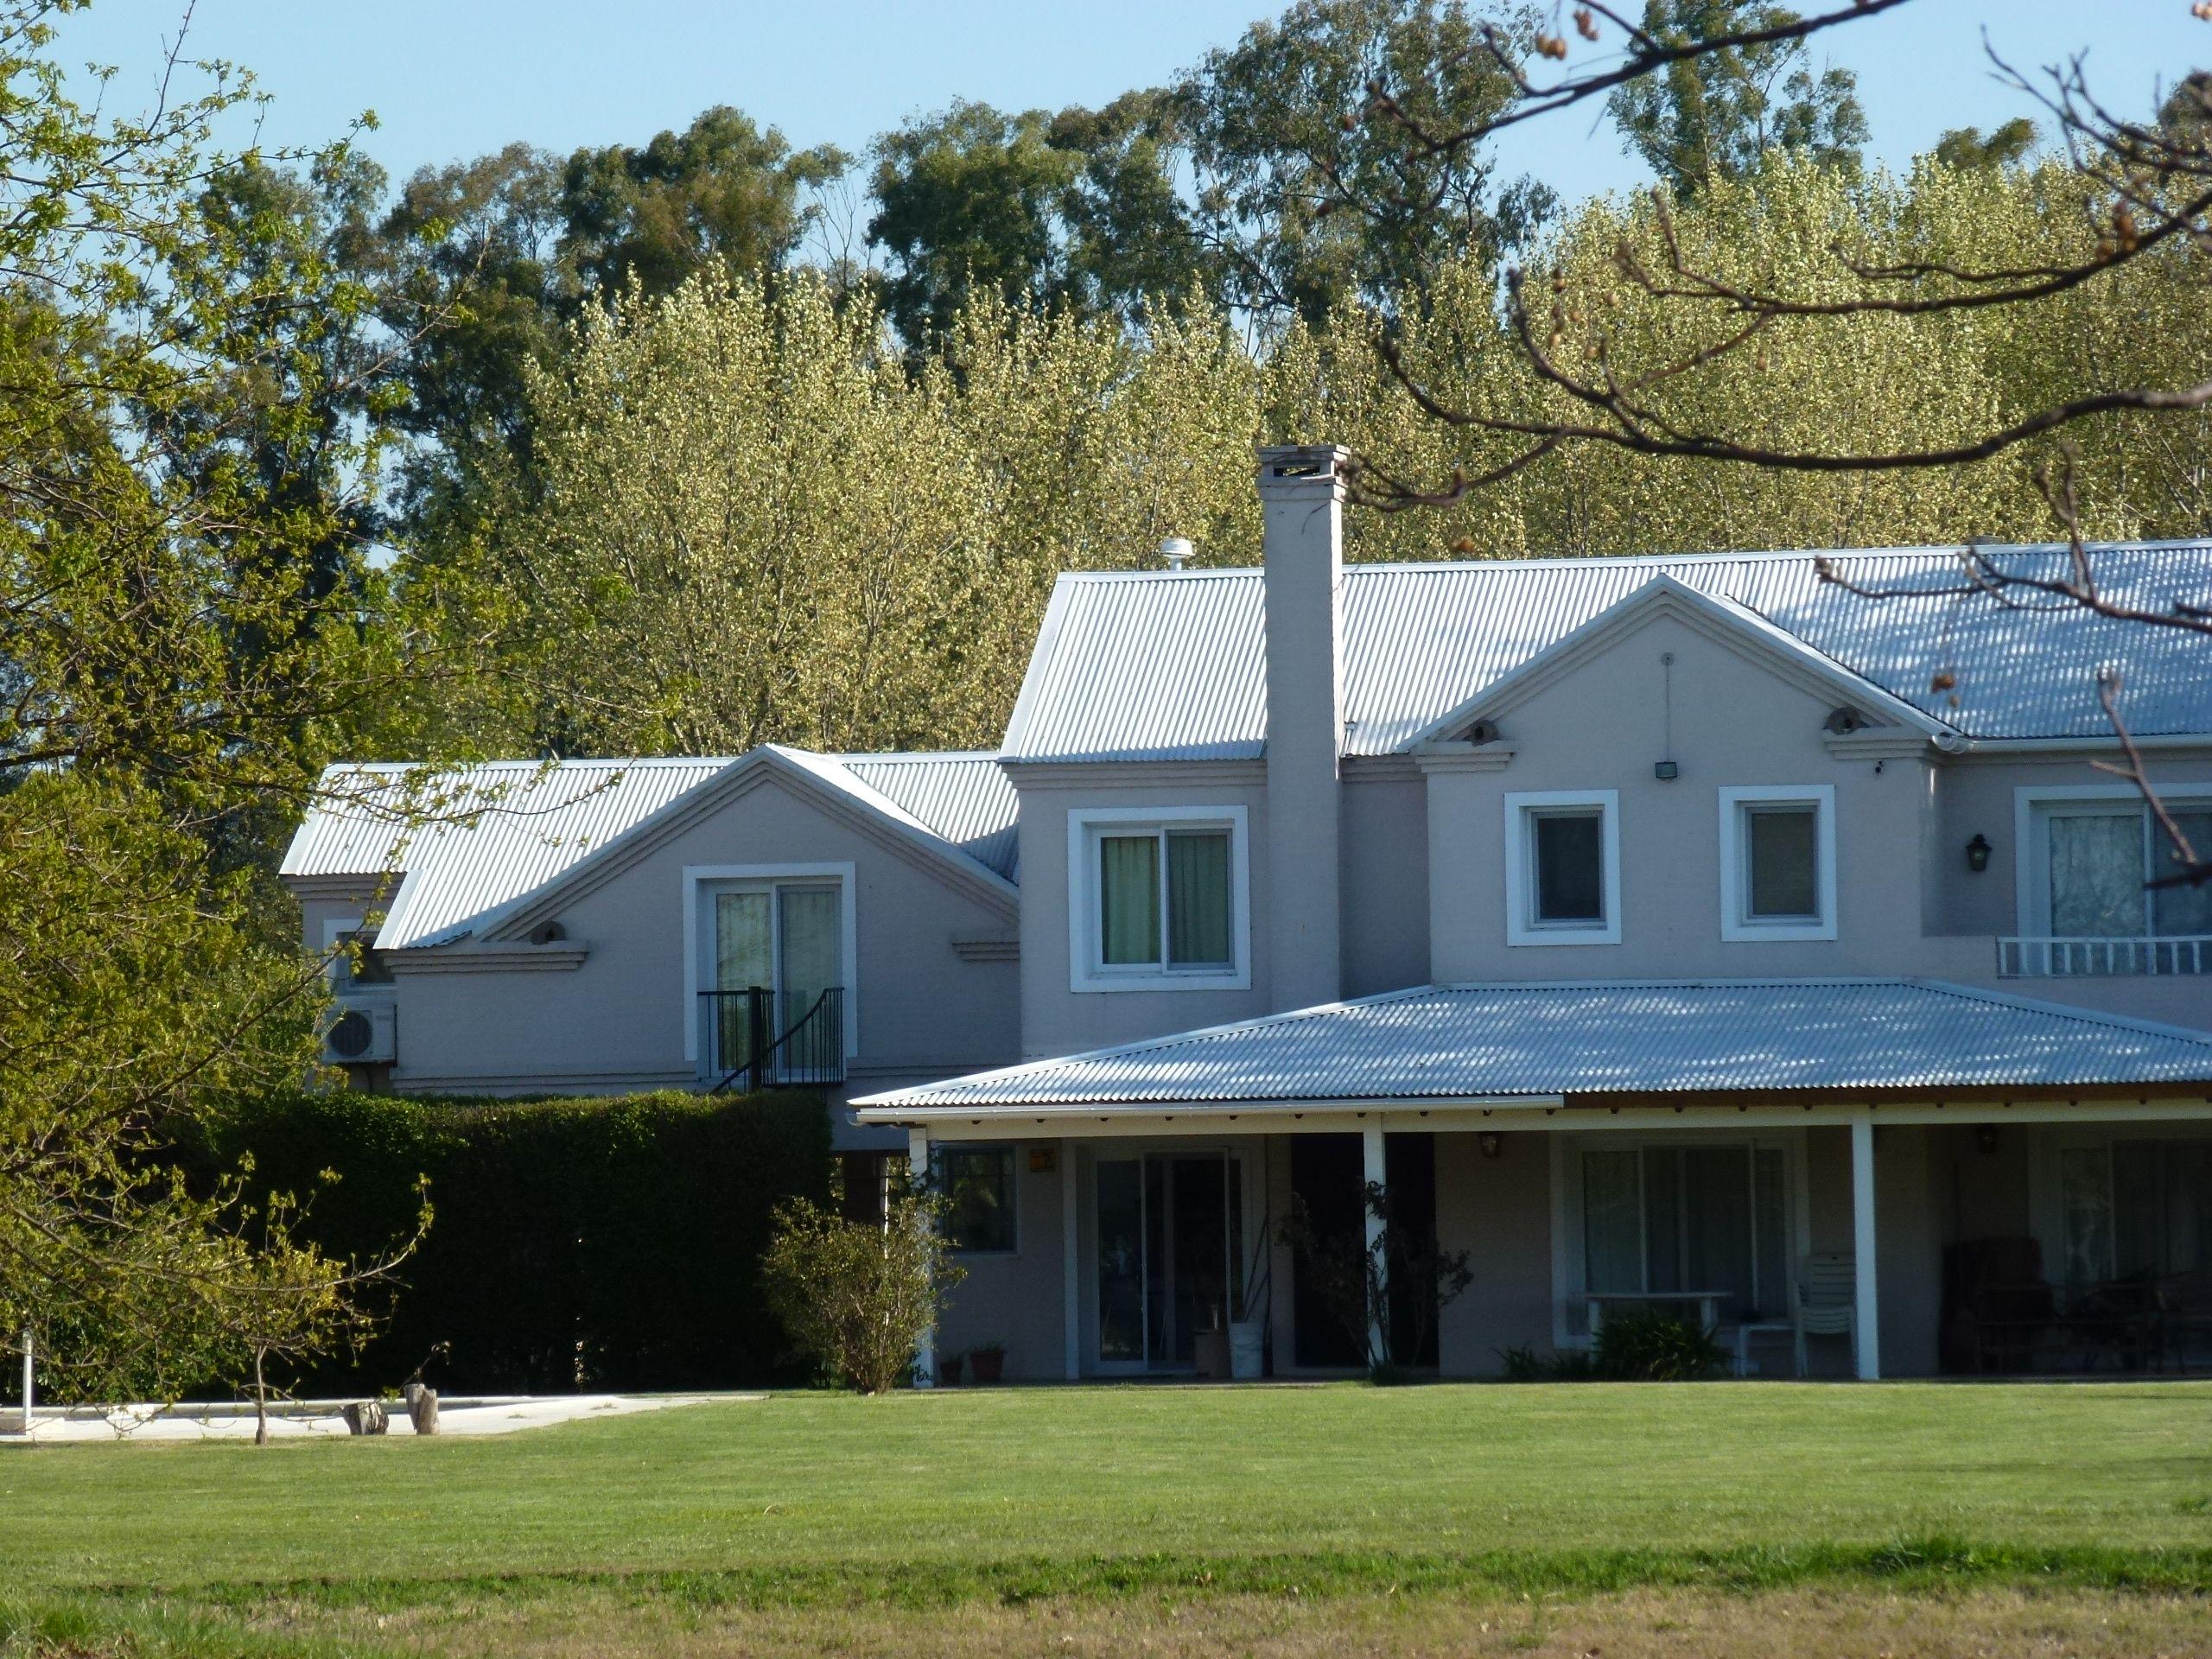 Casa cl sica con techo de chapa blanco en haras san pablo for Casa clasica country